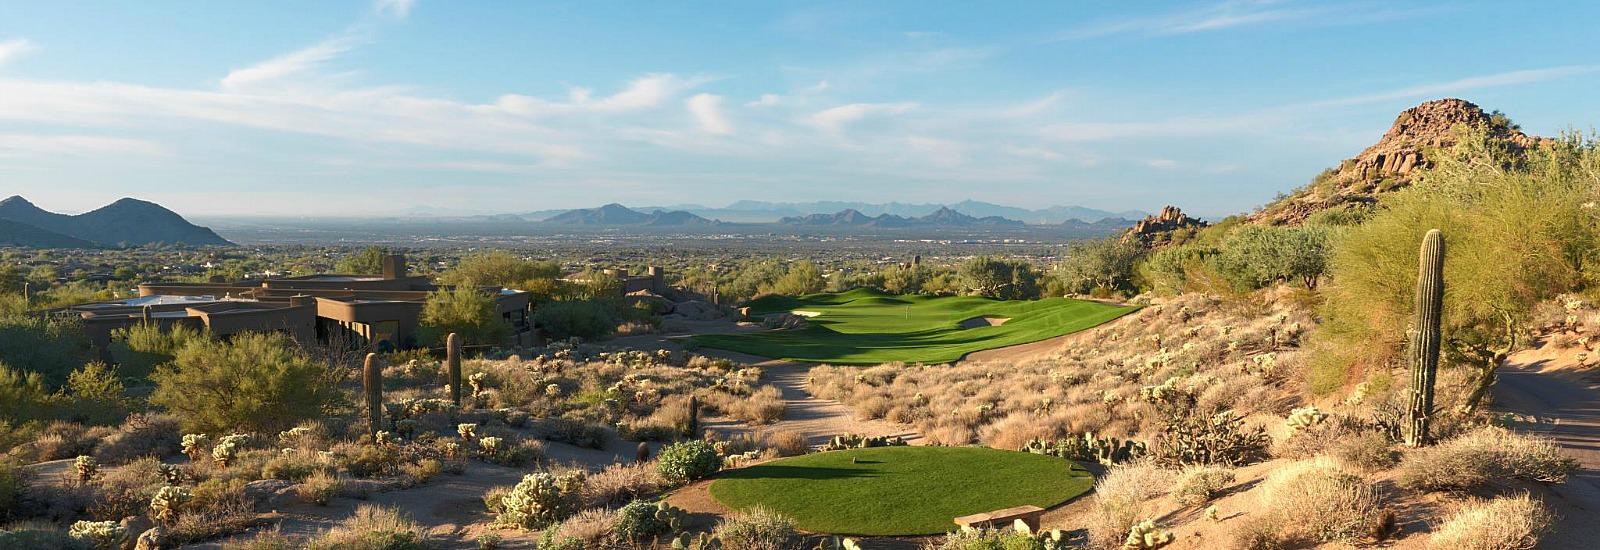 Course Panorama - Desert Highlands